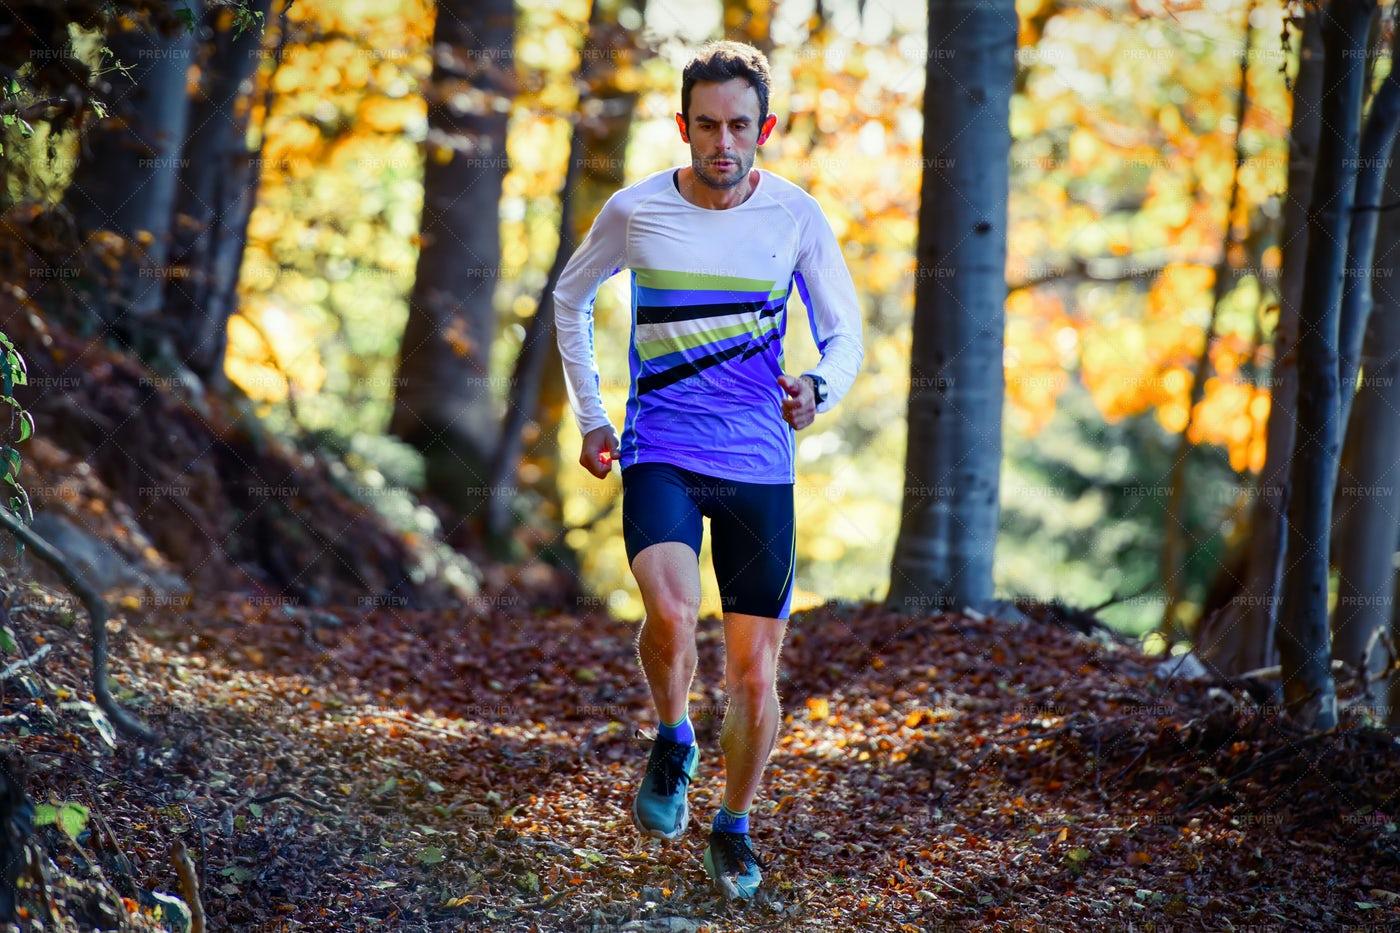 Professional Athlete Runner: Stock Photos